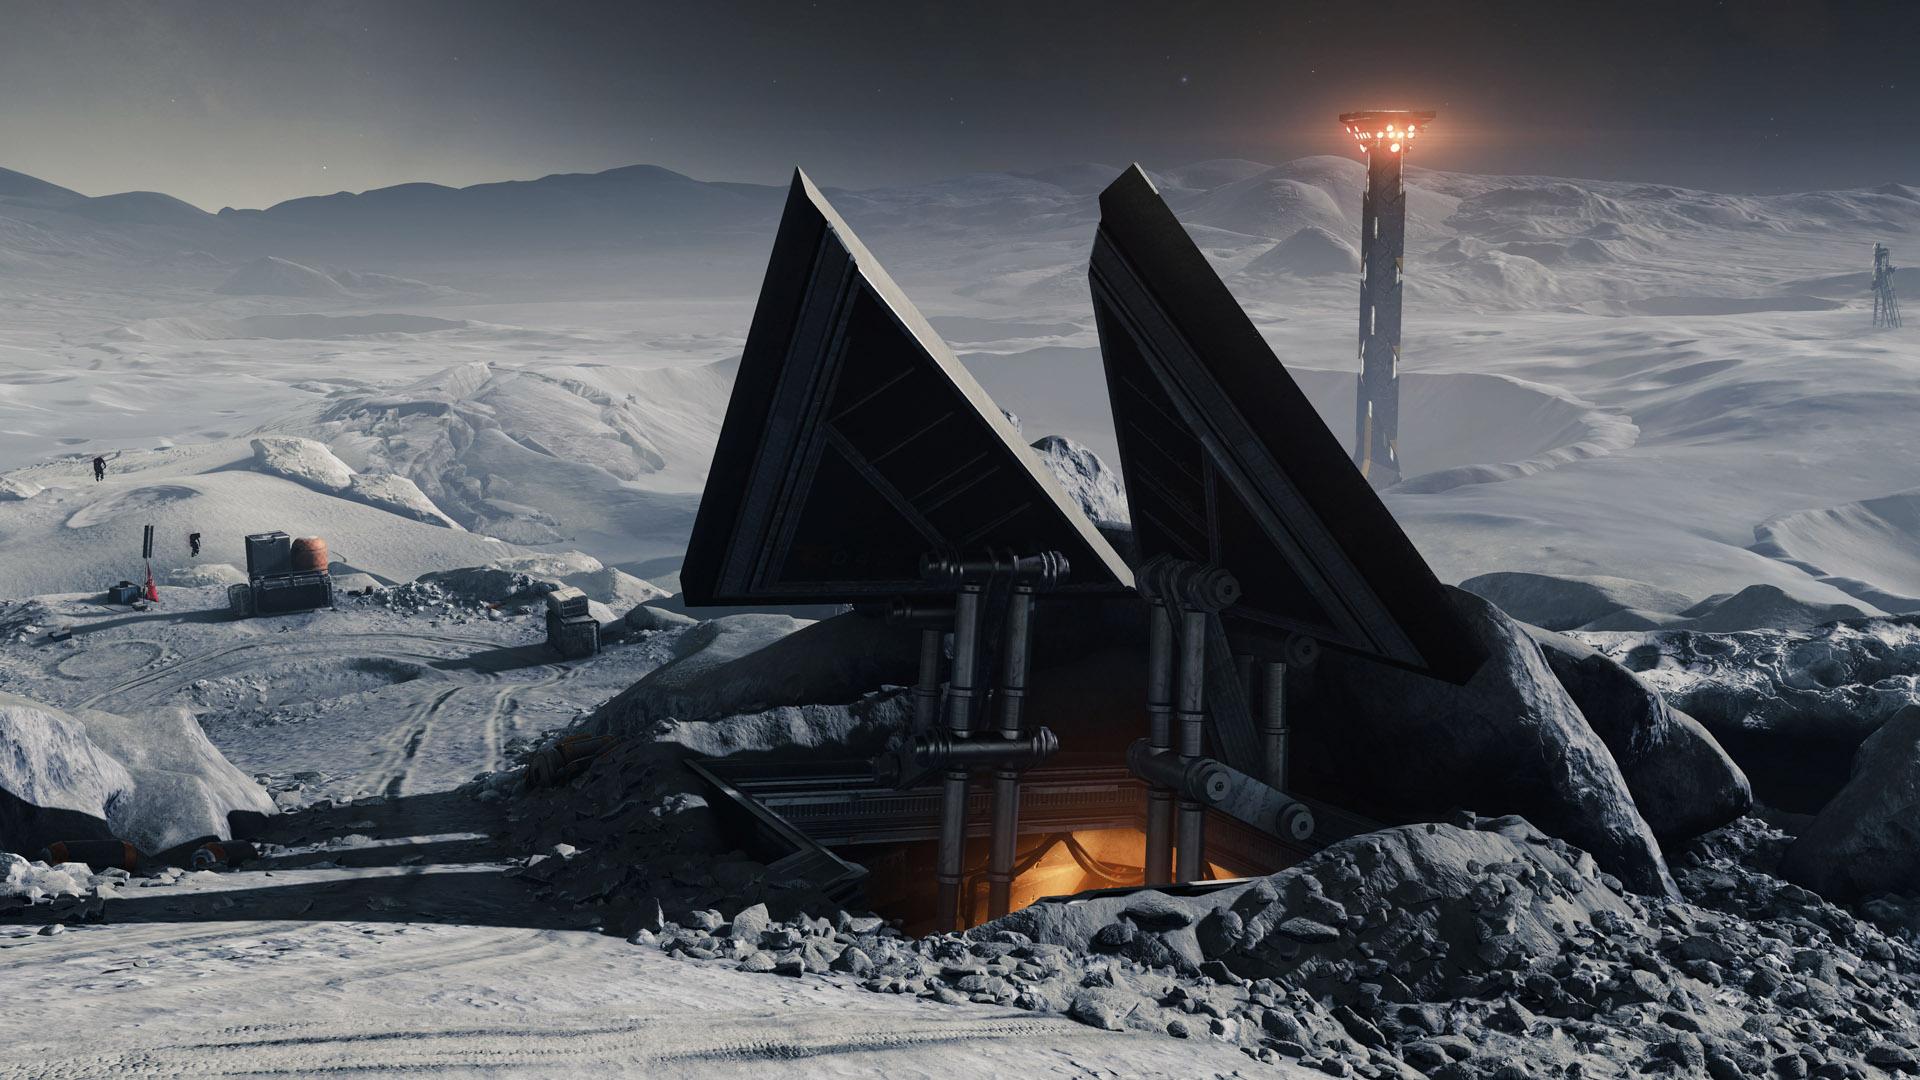 Destiny 2 Season of the Worthy moon bunker